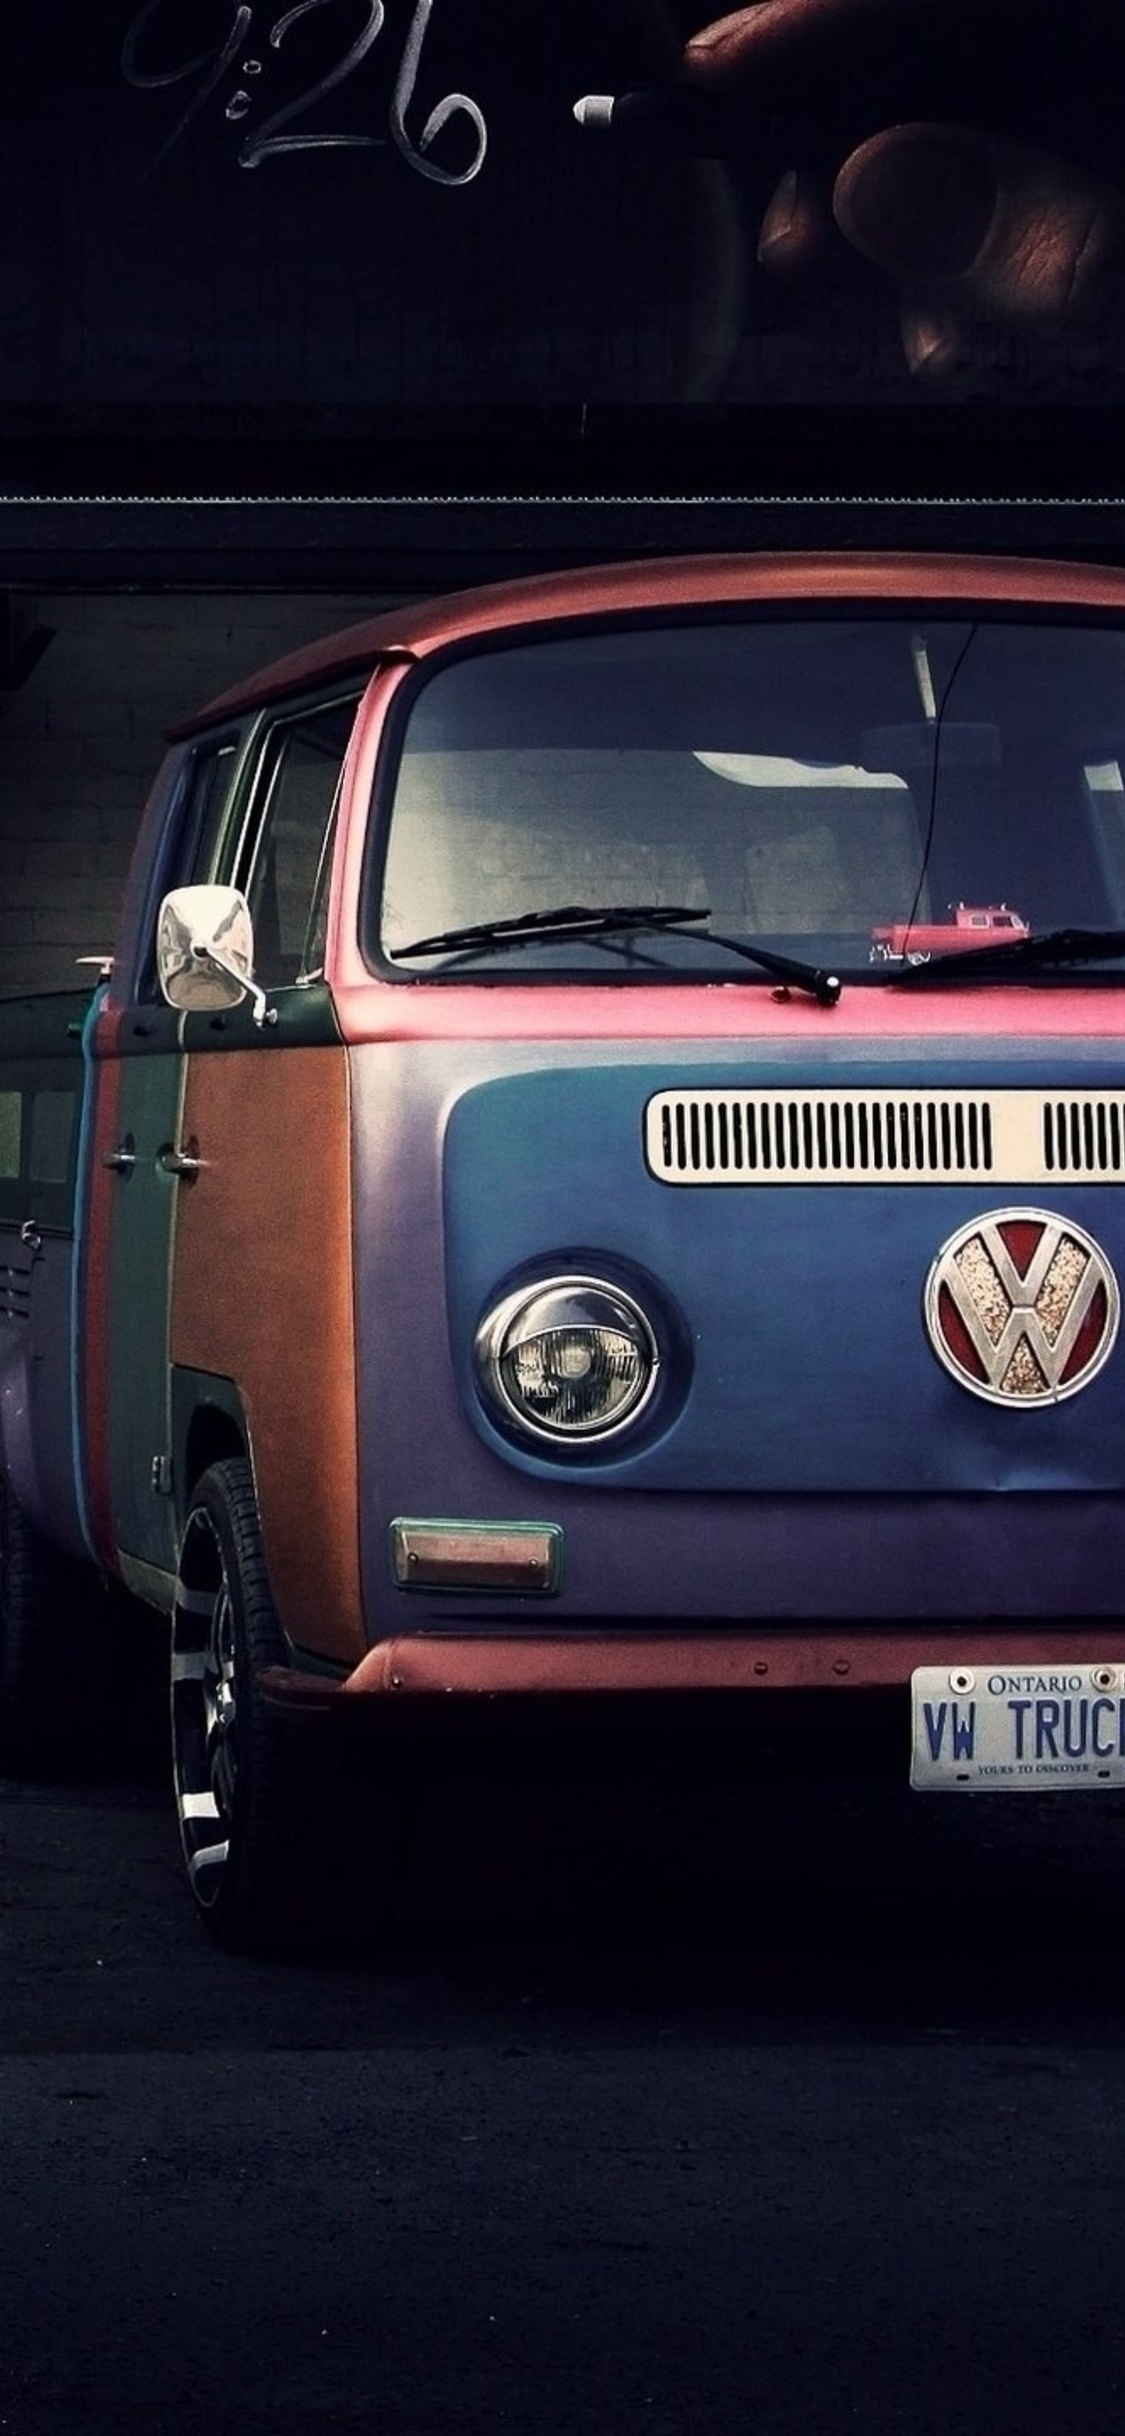 1125x2436 Volkswagen Van Iphone Xs Iphone 10 Iphone X Hd 4k Wallpapers Images Backgrounds Photos And Pictures